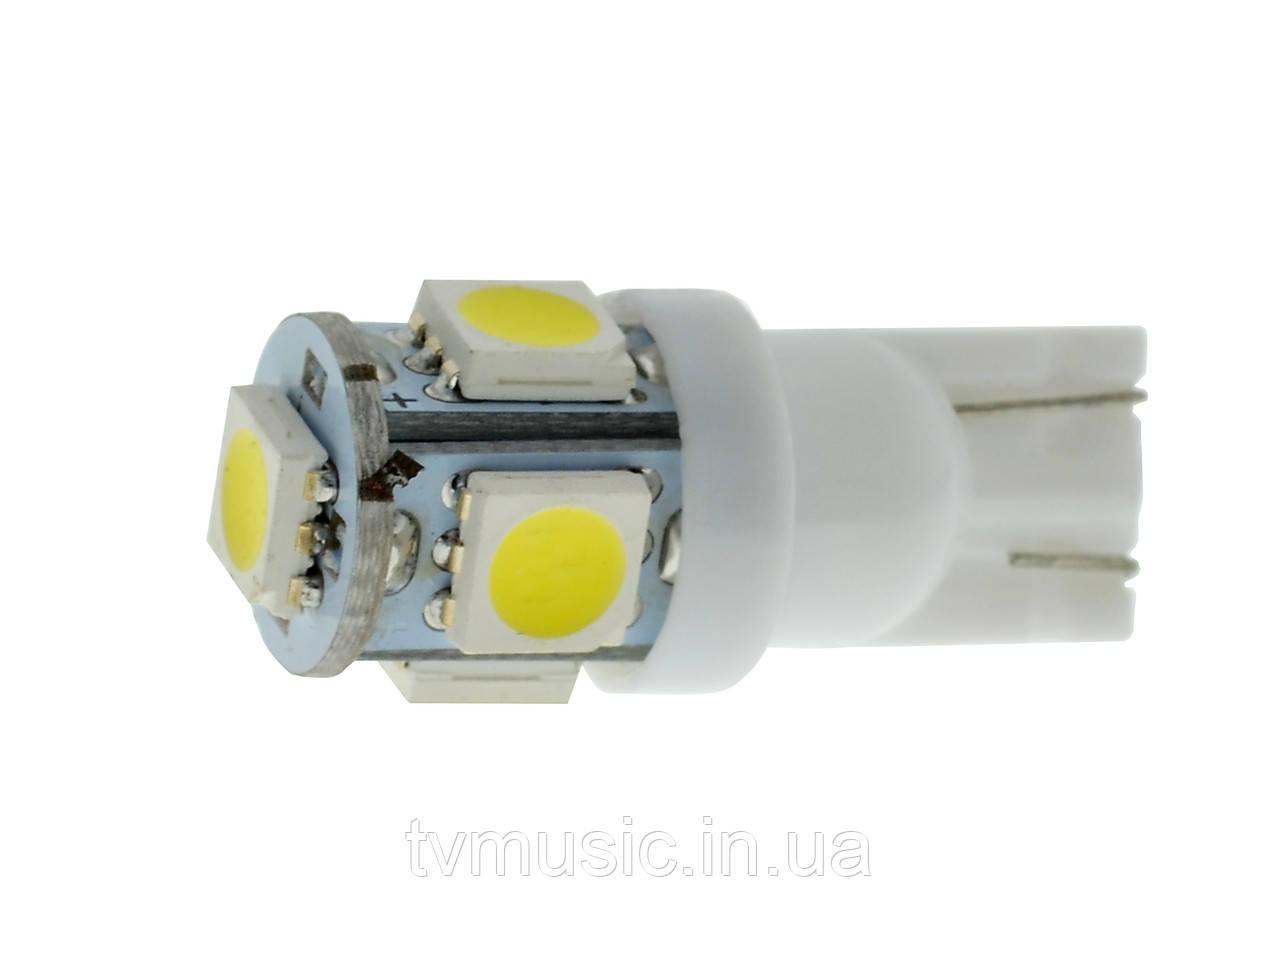 LED лампа Cyclon T10-038 5050-5 12V MJ